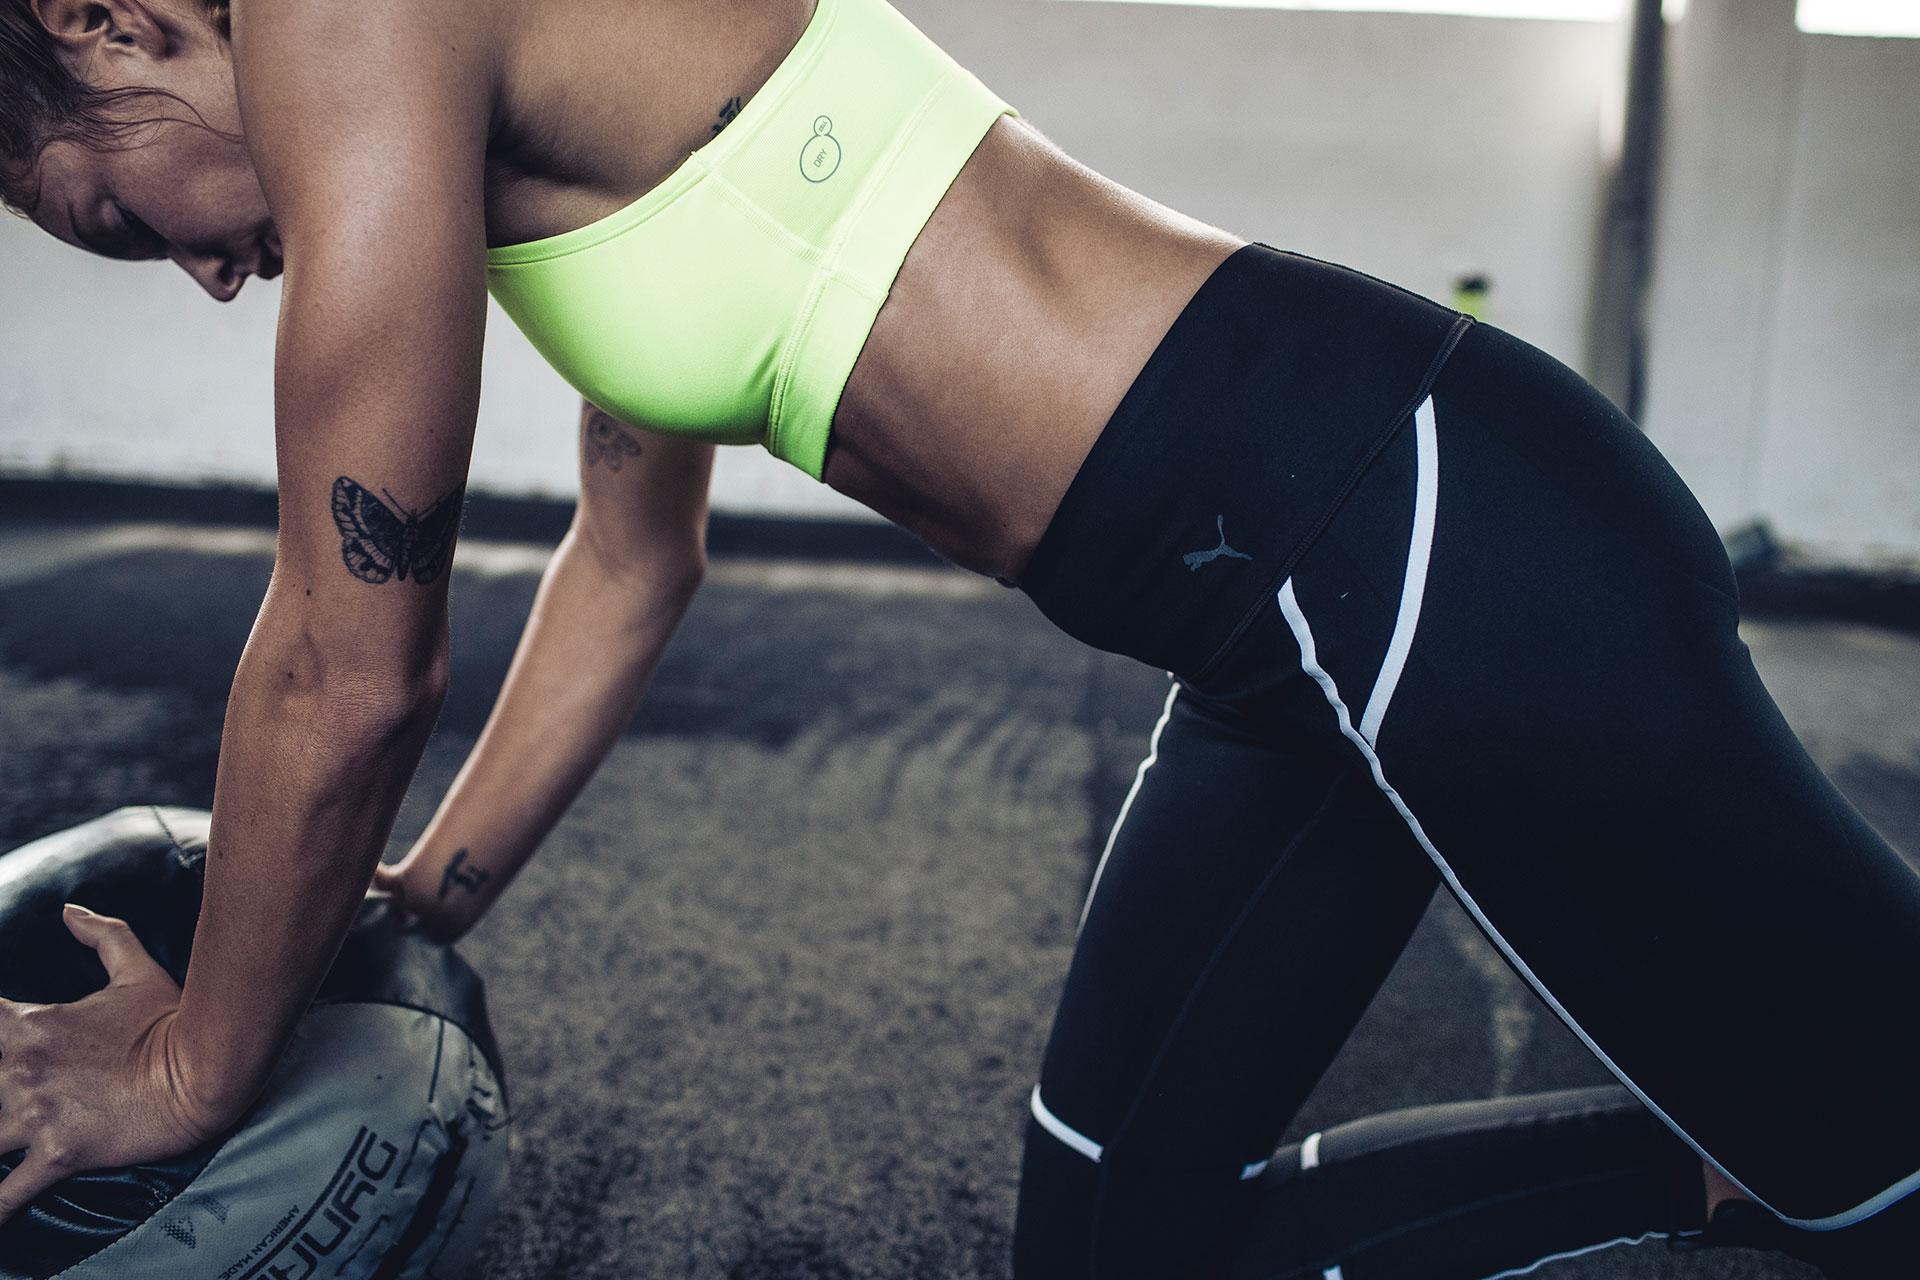 pause sport fotograf fitness training-crossfit sport deutschland berlin